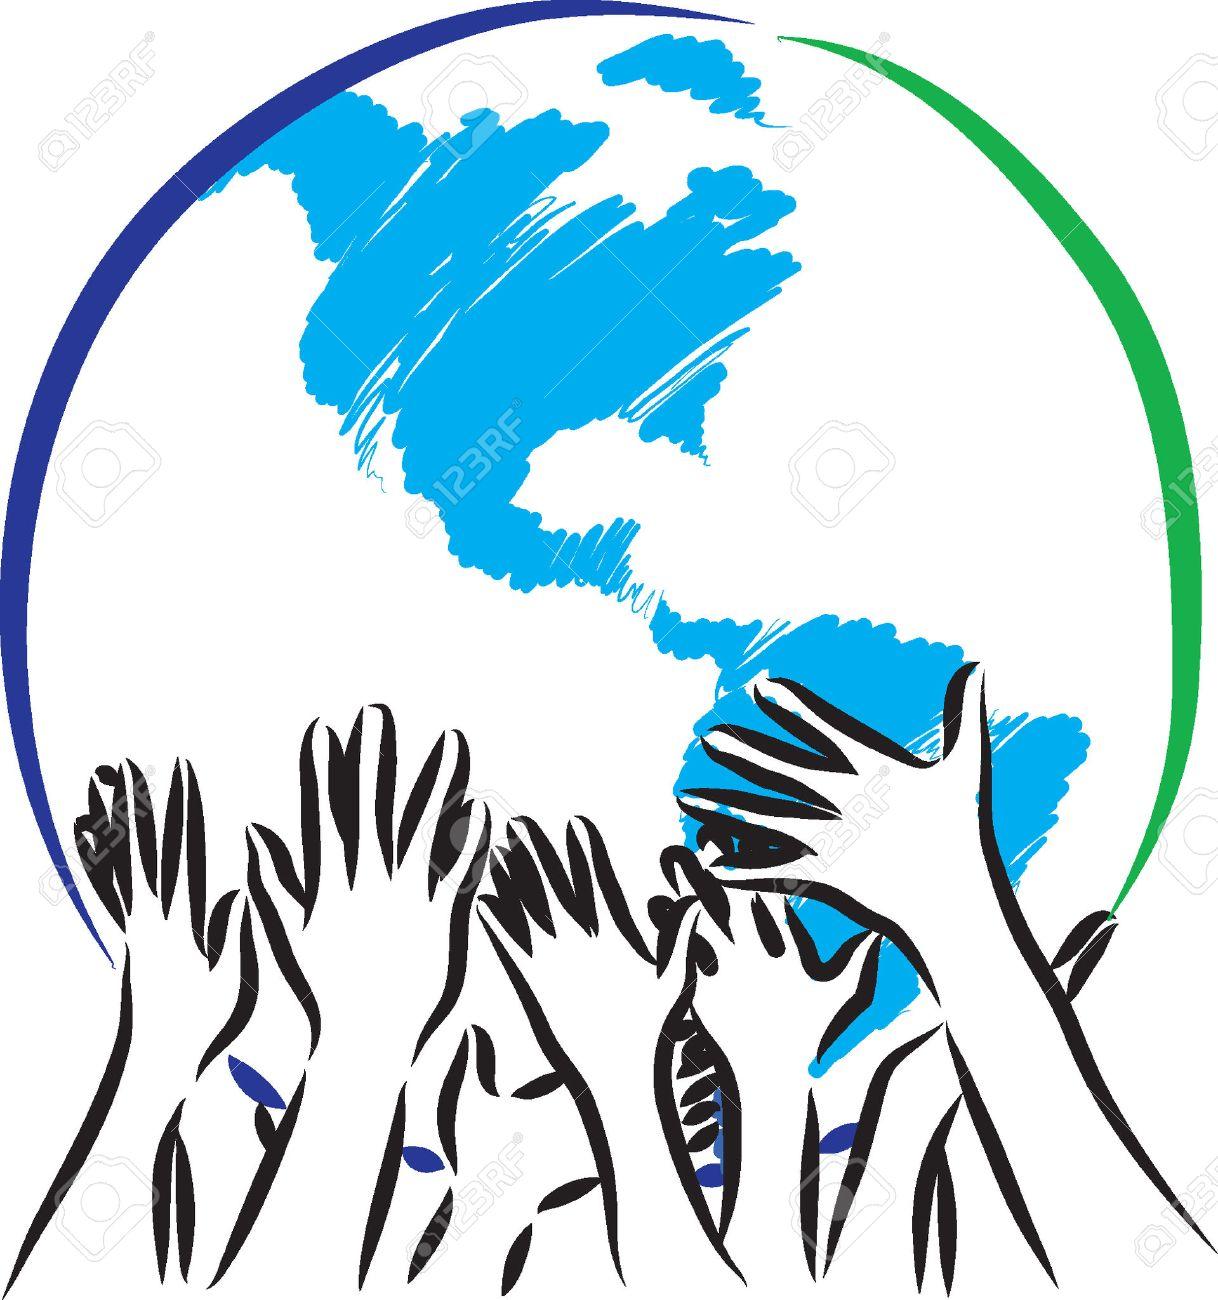 earth taking care hands illustration - 37237836